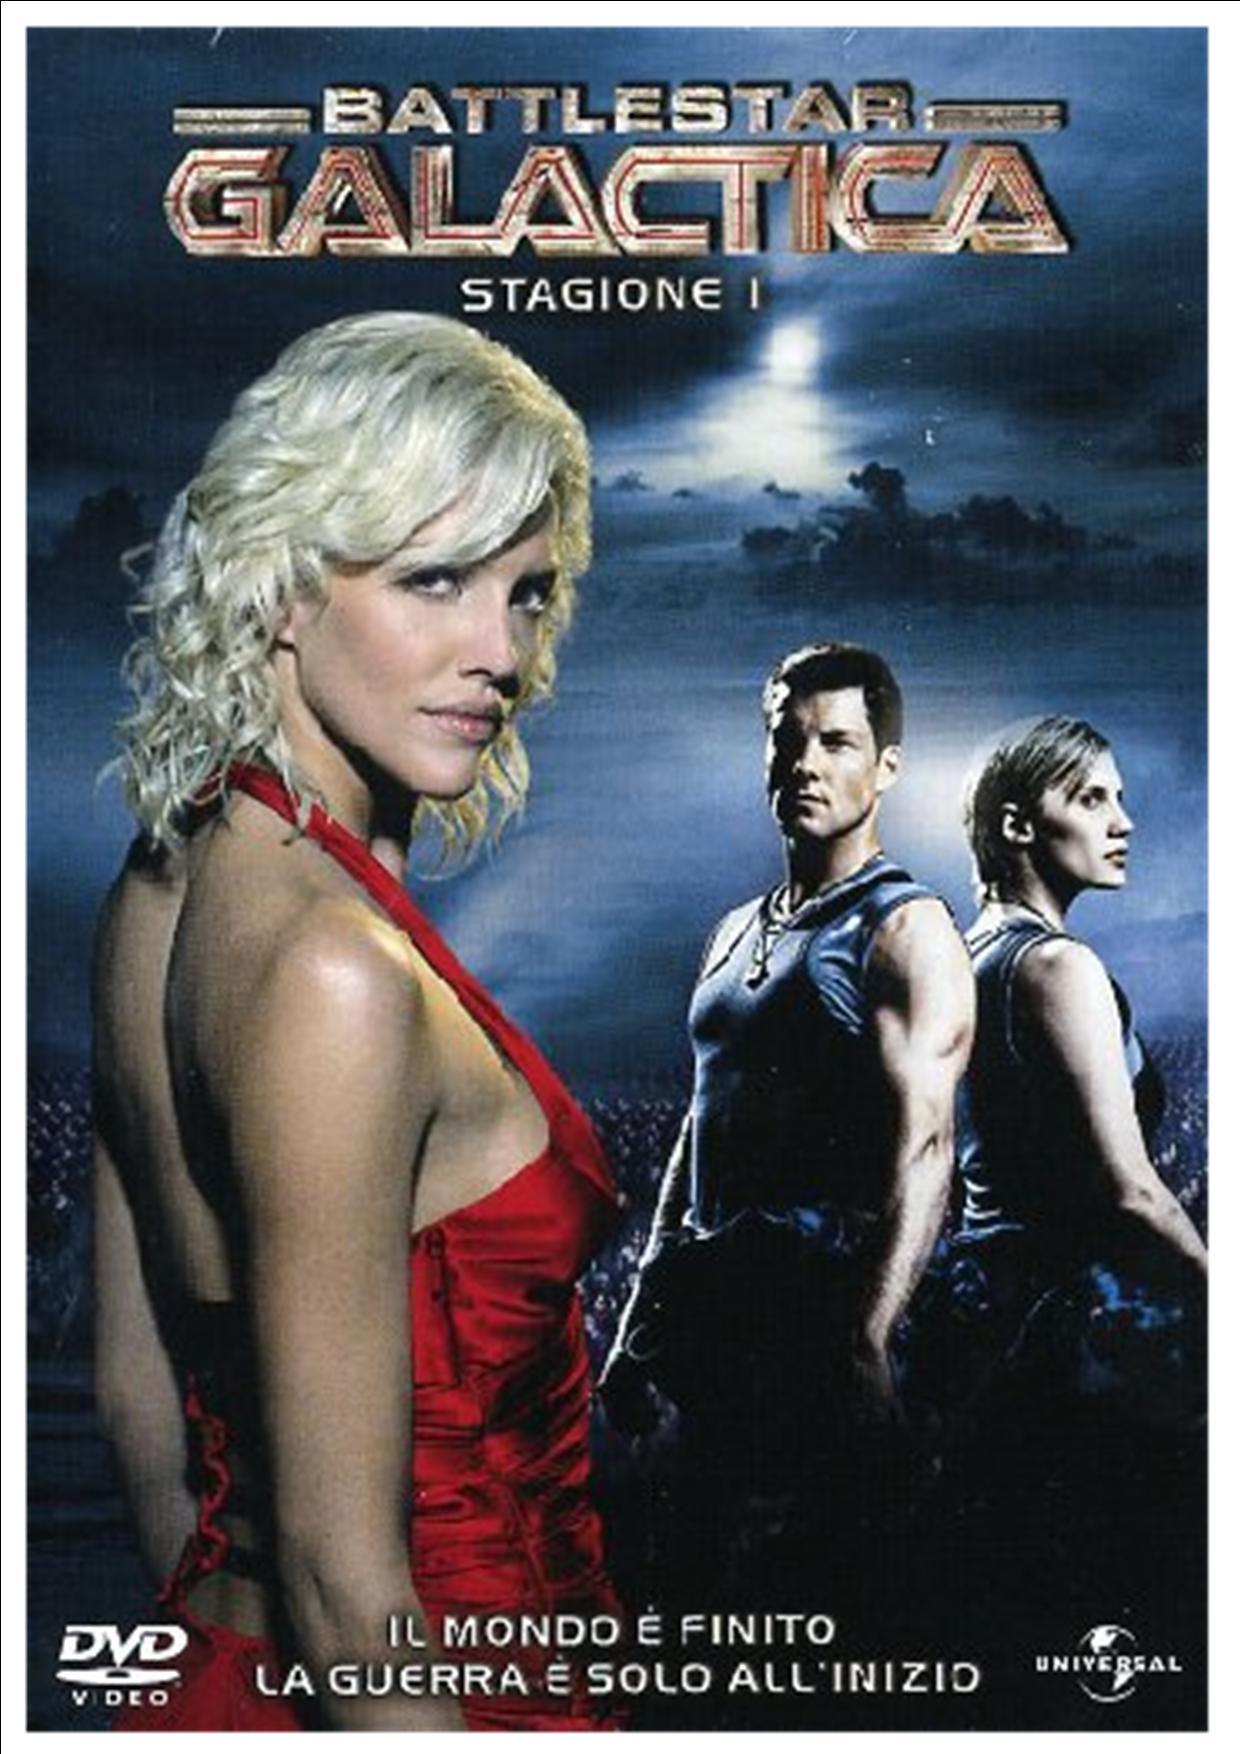 COF.BATTLESTAR GALACTICA - STAG.01 (4 DVD) (DVD)